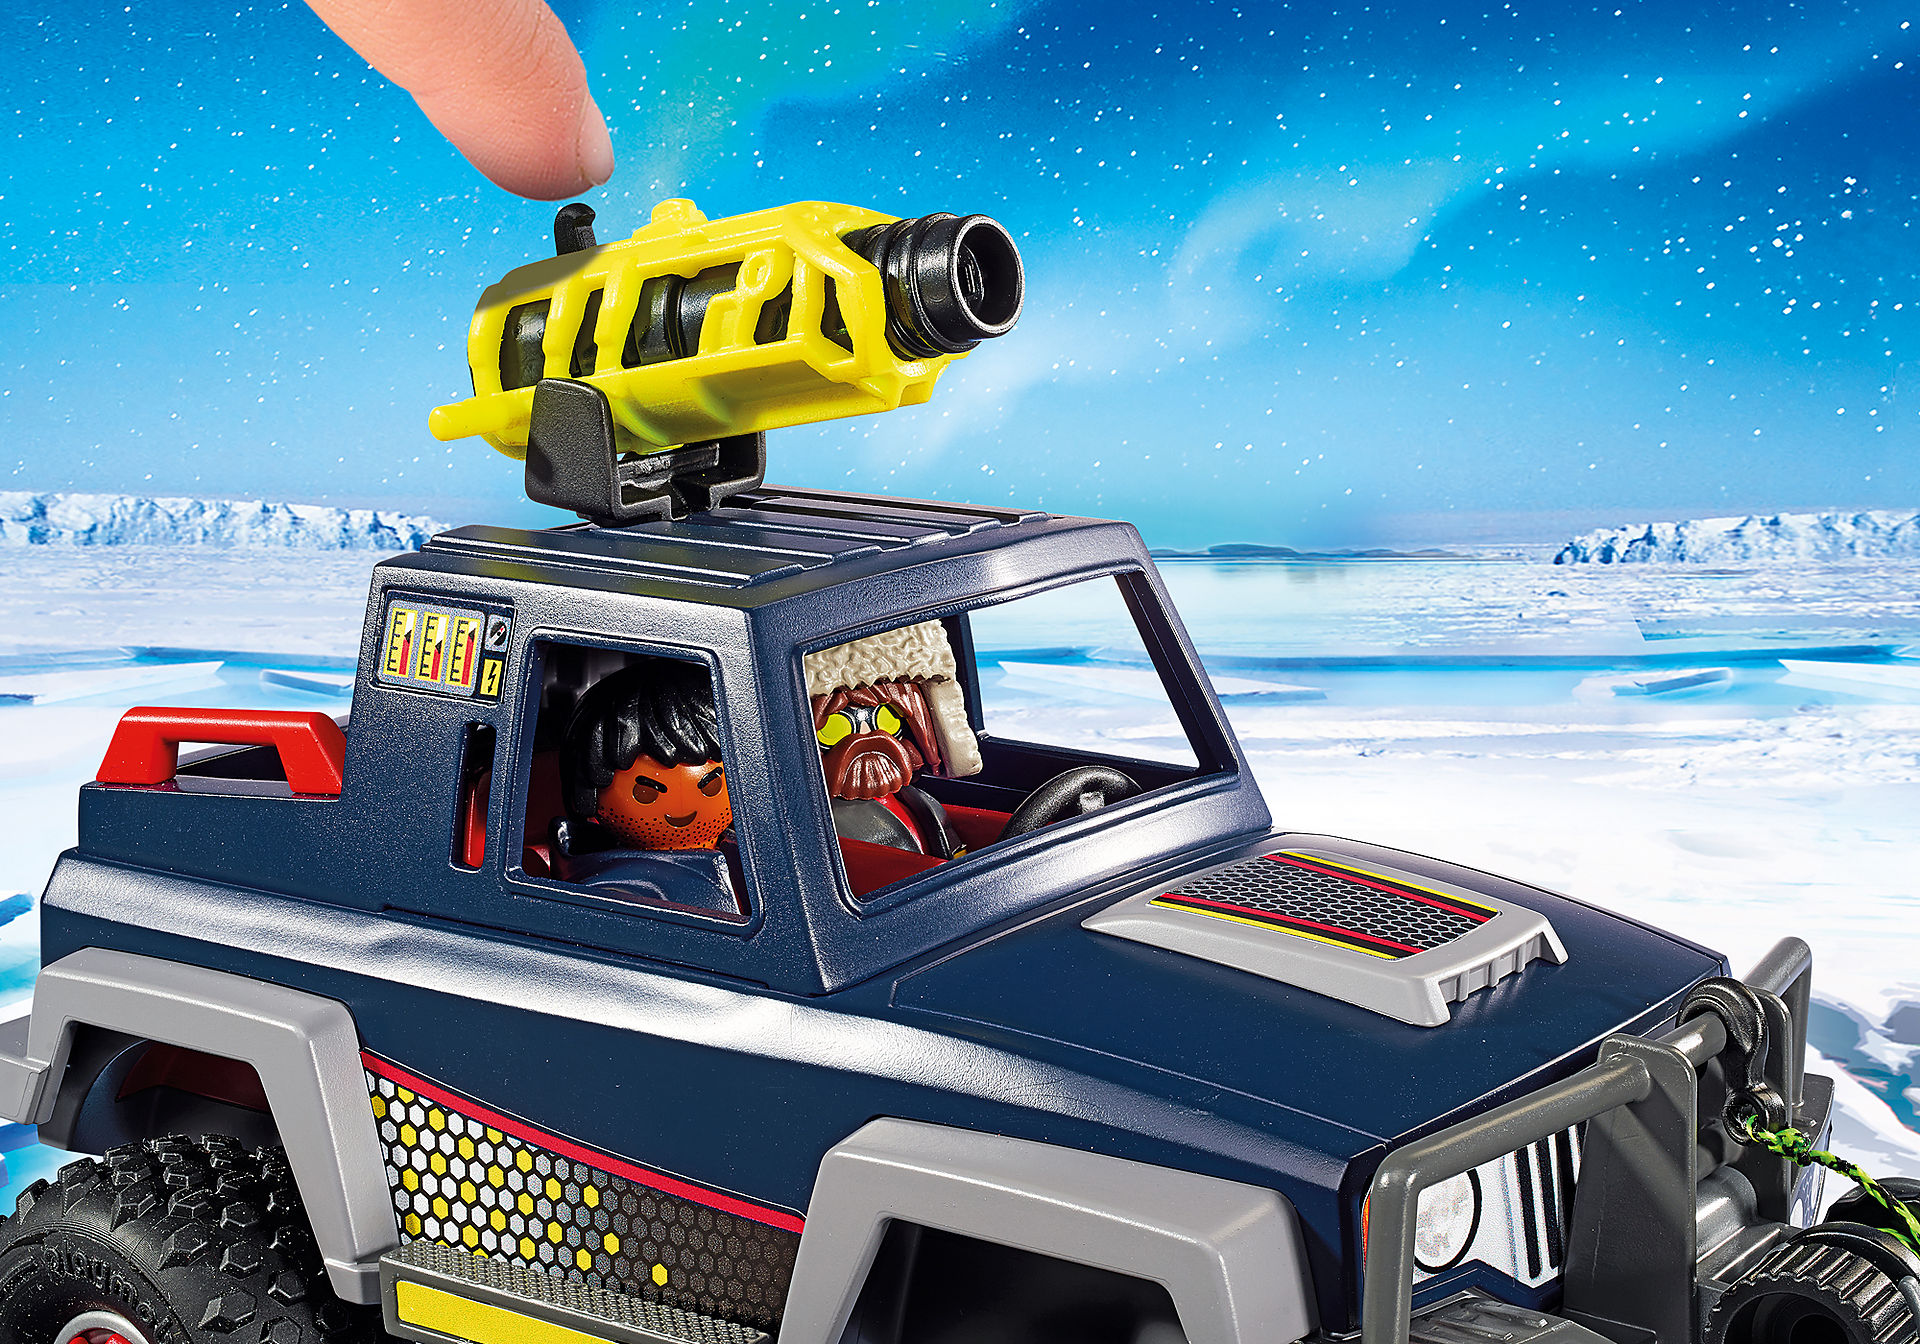 http://media.playmobil.com/i/playmobil/9059_product_extra1/Eispiraten-Truck